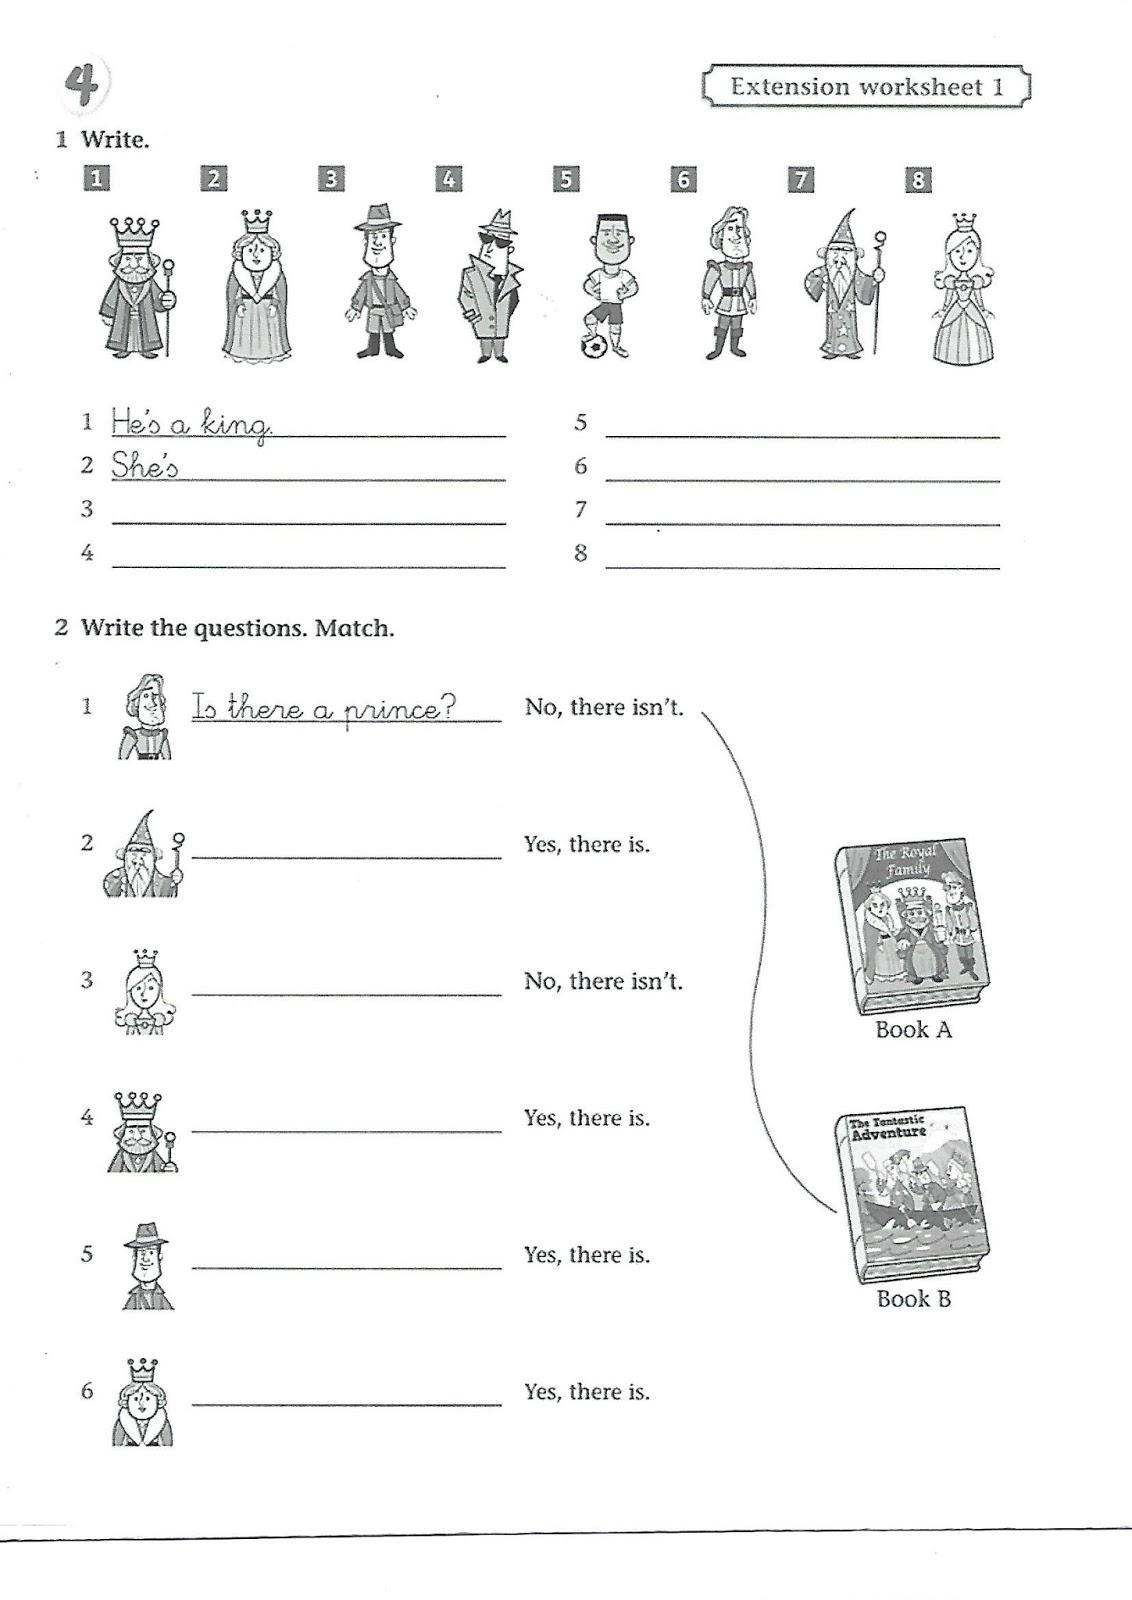 Colegio Galaxia English Class Extra Activities For Third Grade Unit 4 Actividades Extra